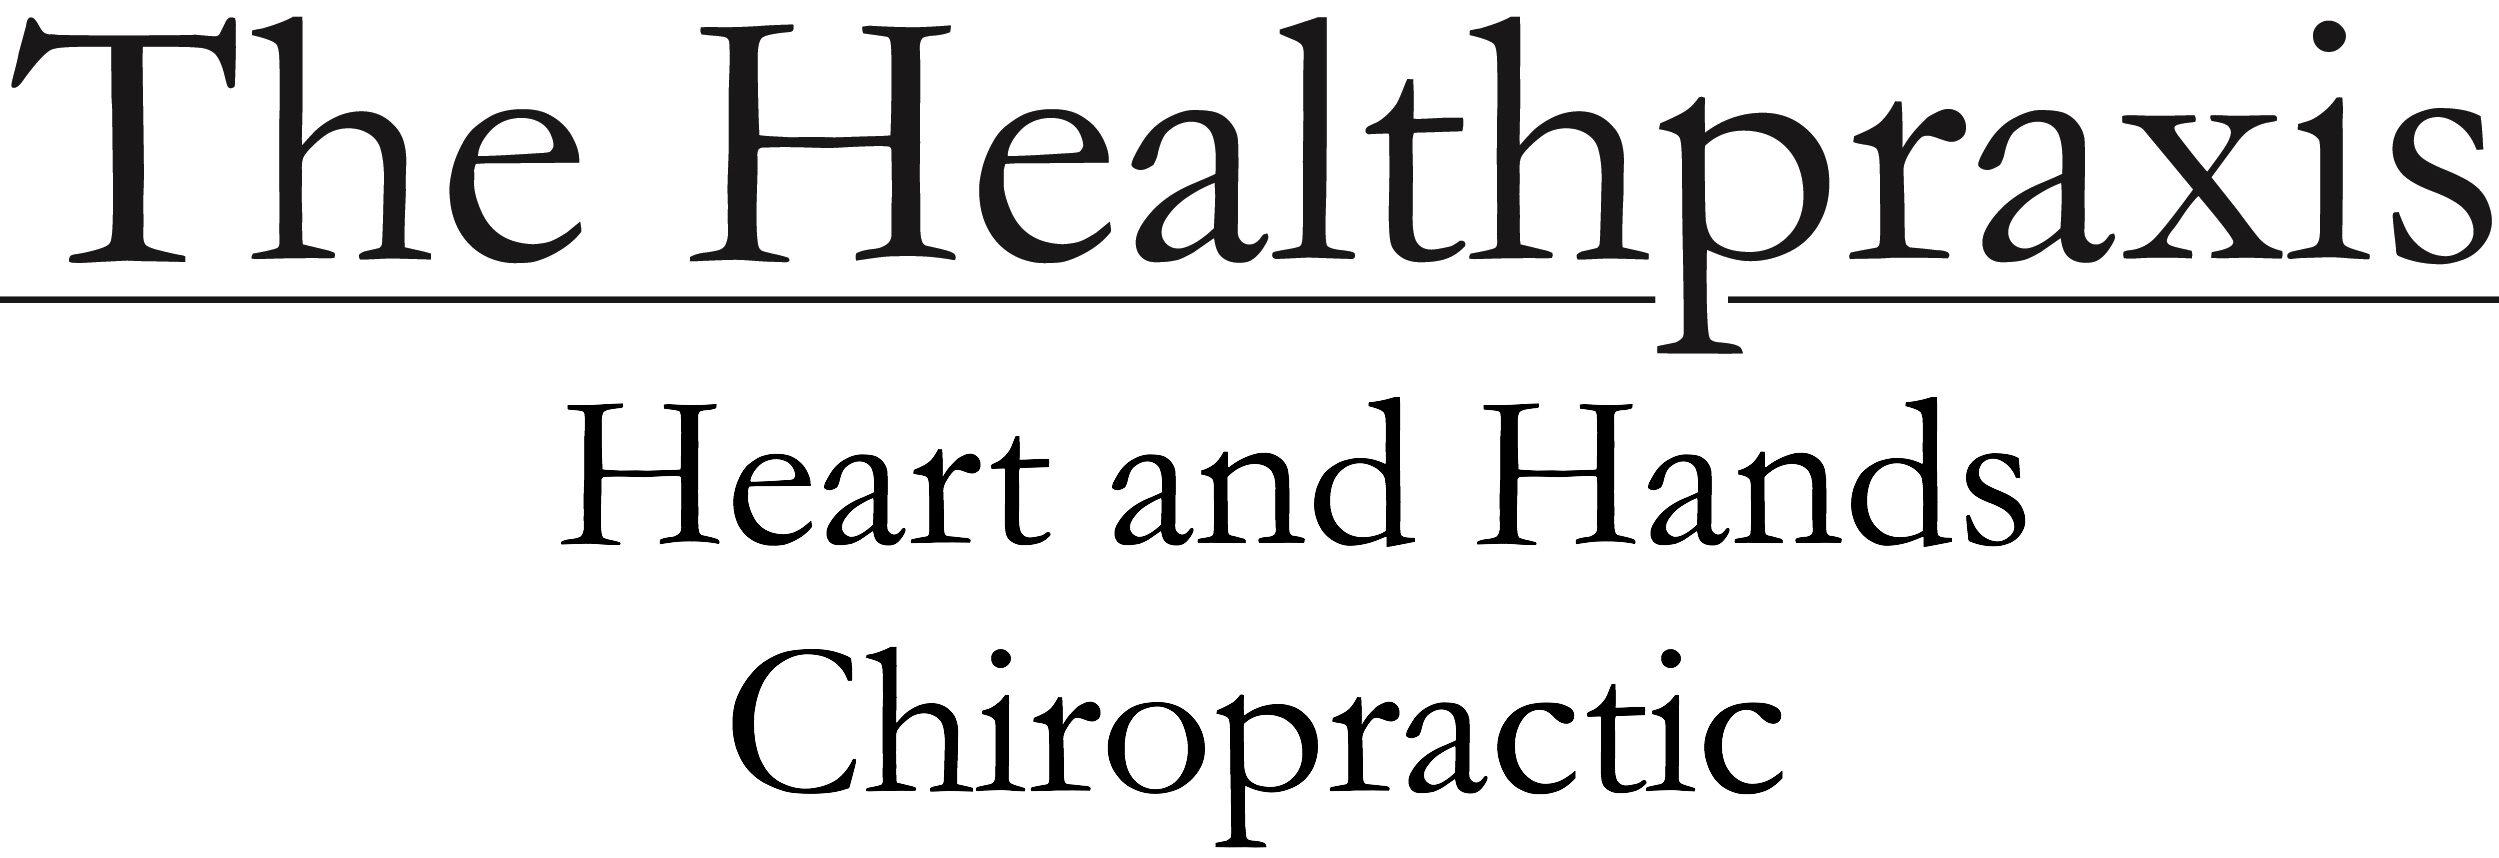 The Healthpraxis Barnstaple & Bideford